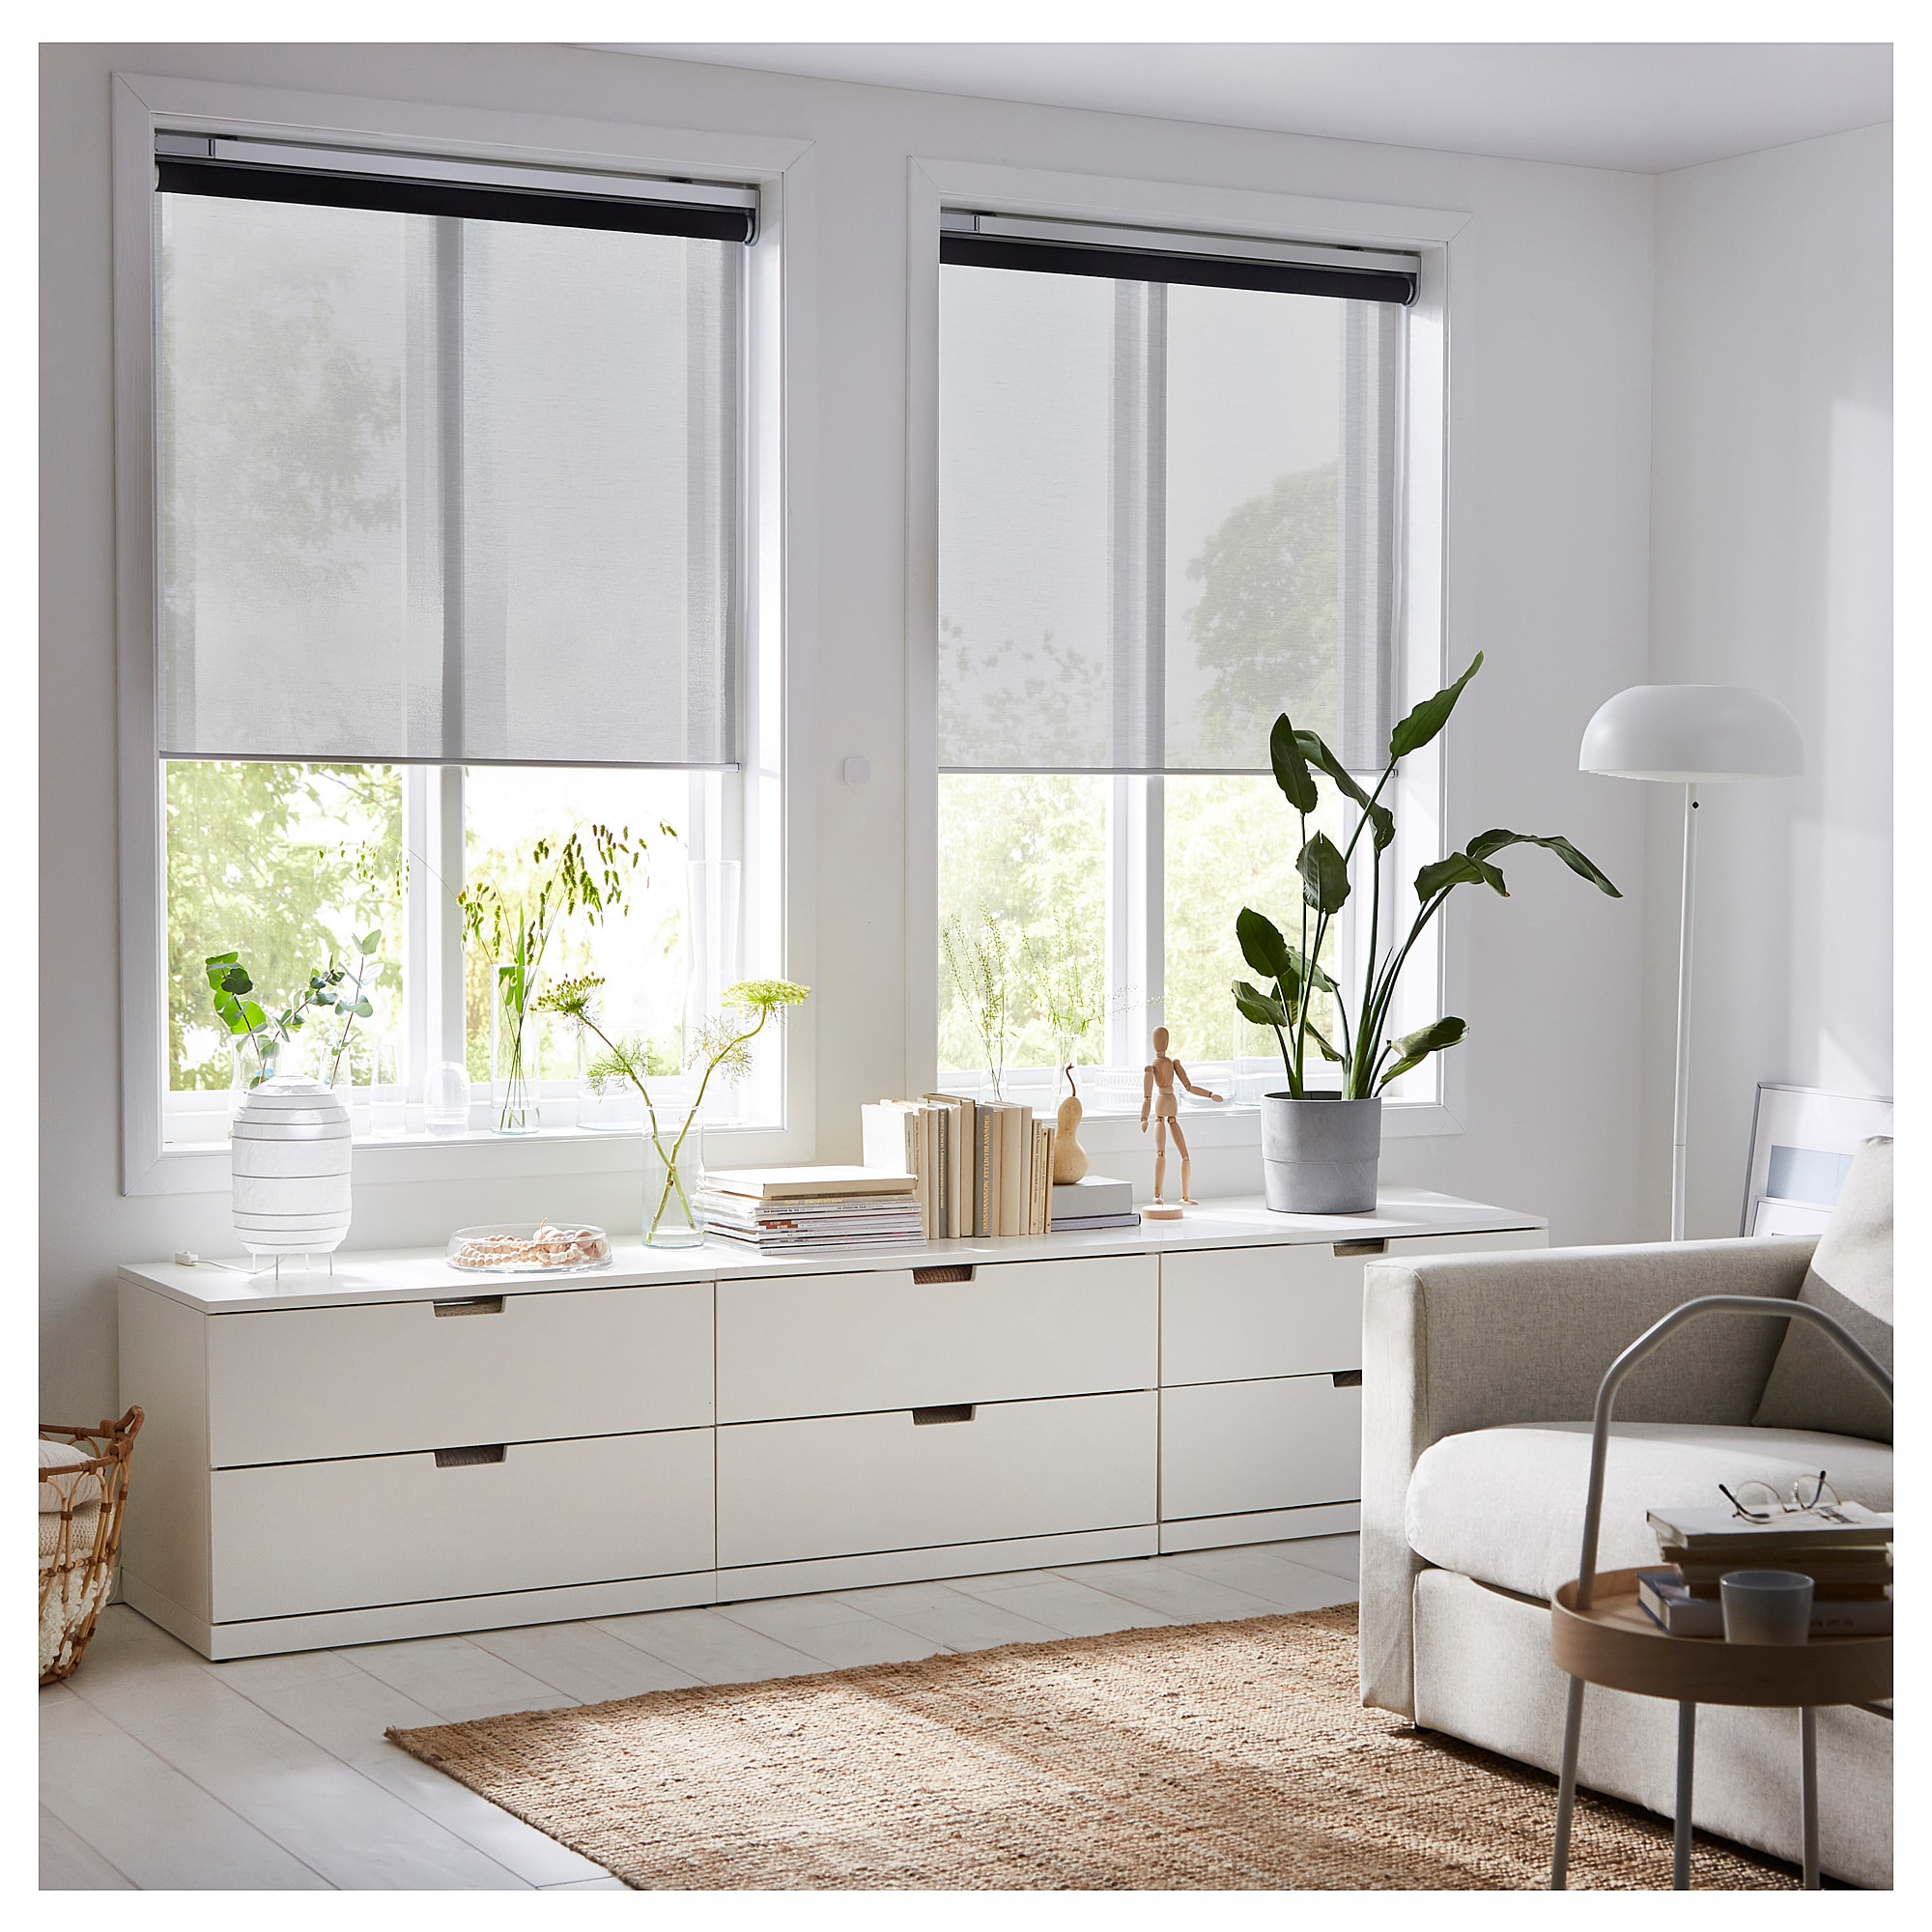 ikea rend les stores compatibles homekit. Black Bedroom Furniture Sets. Home Design Ideas